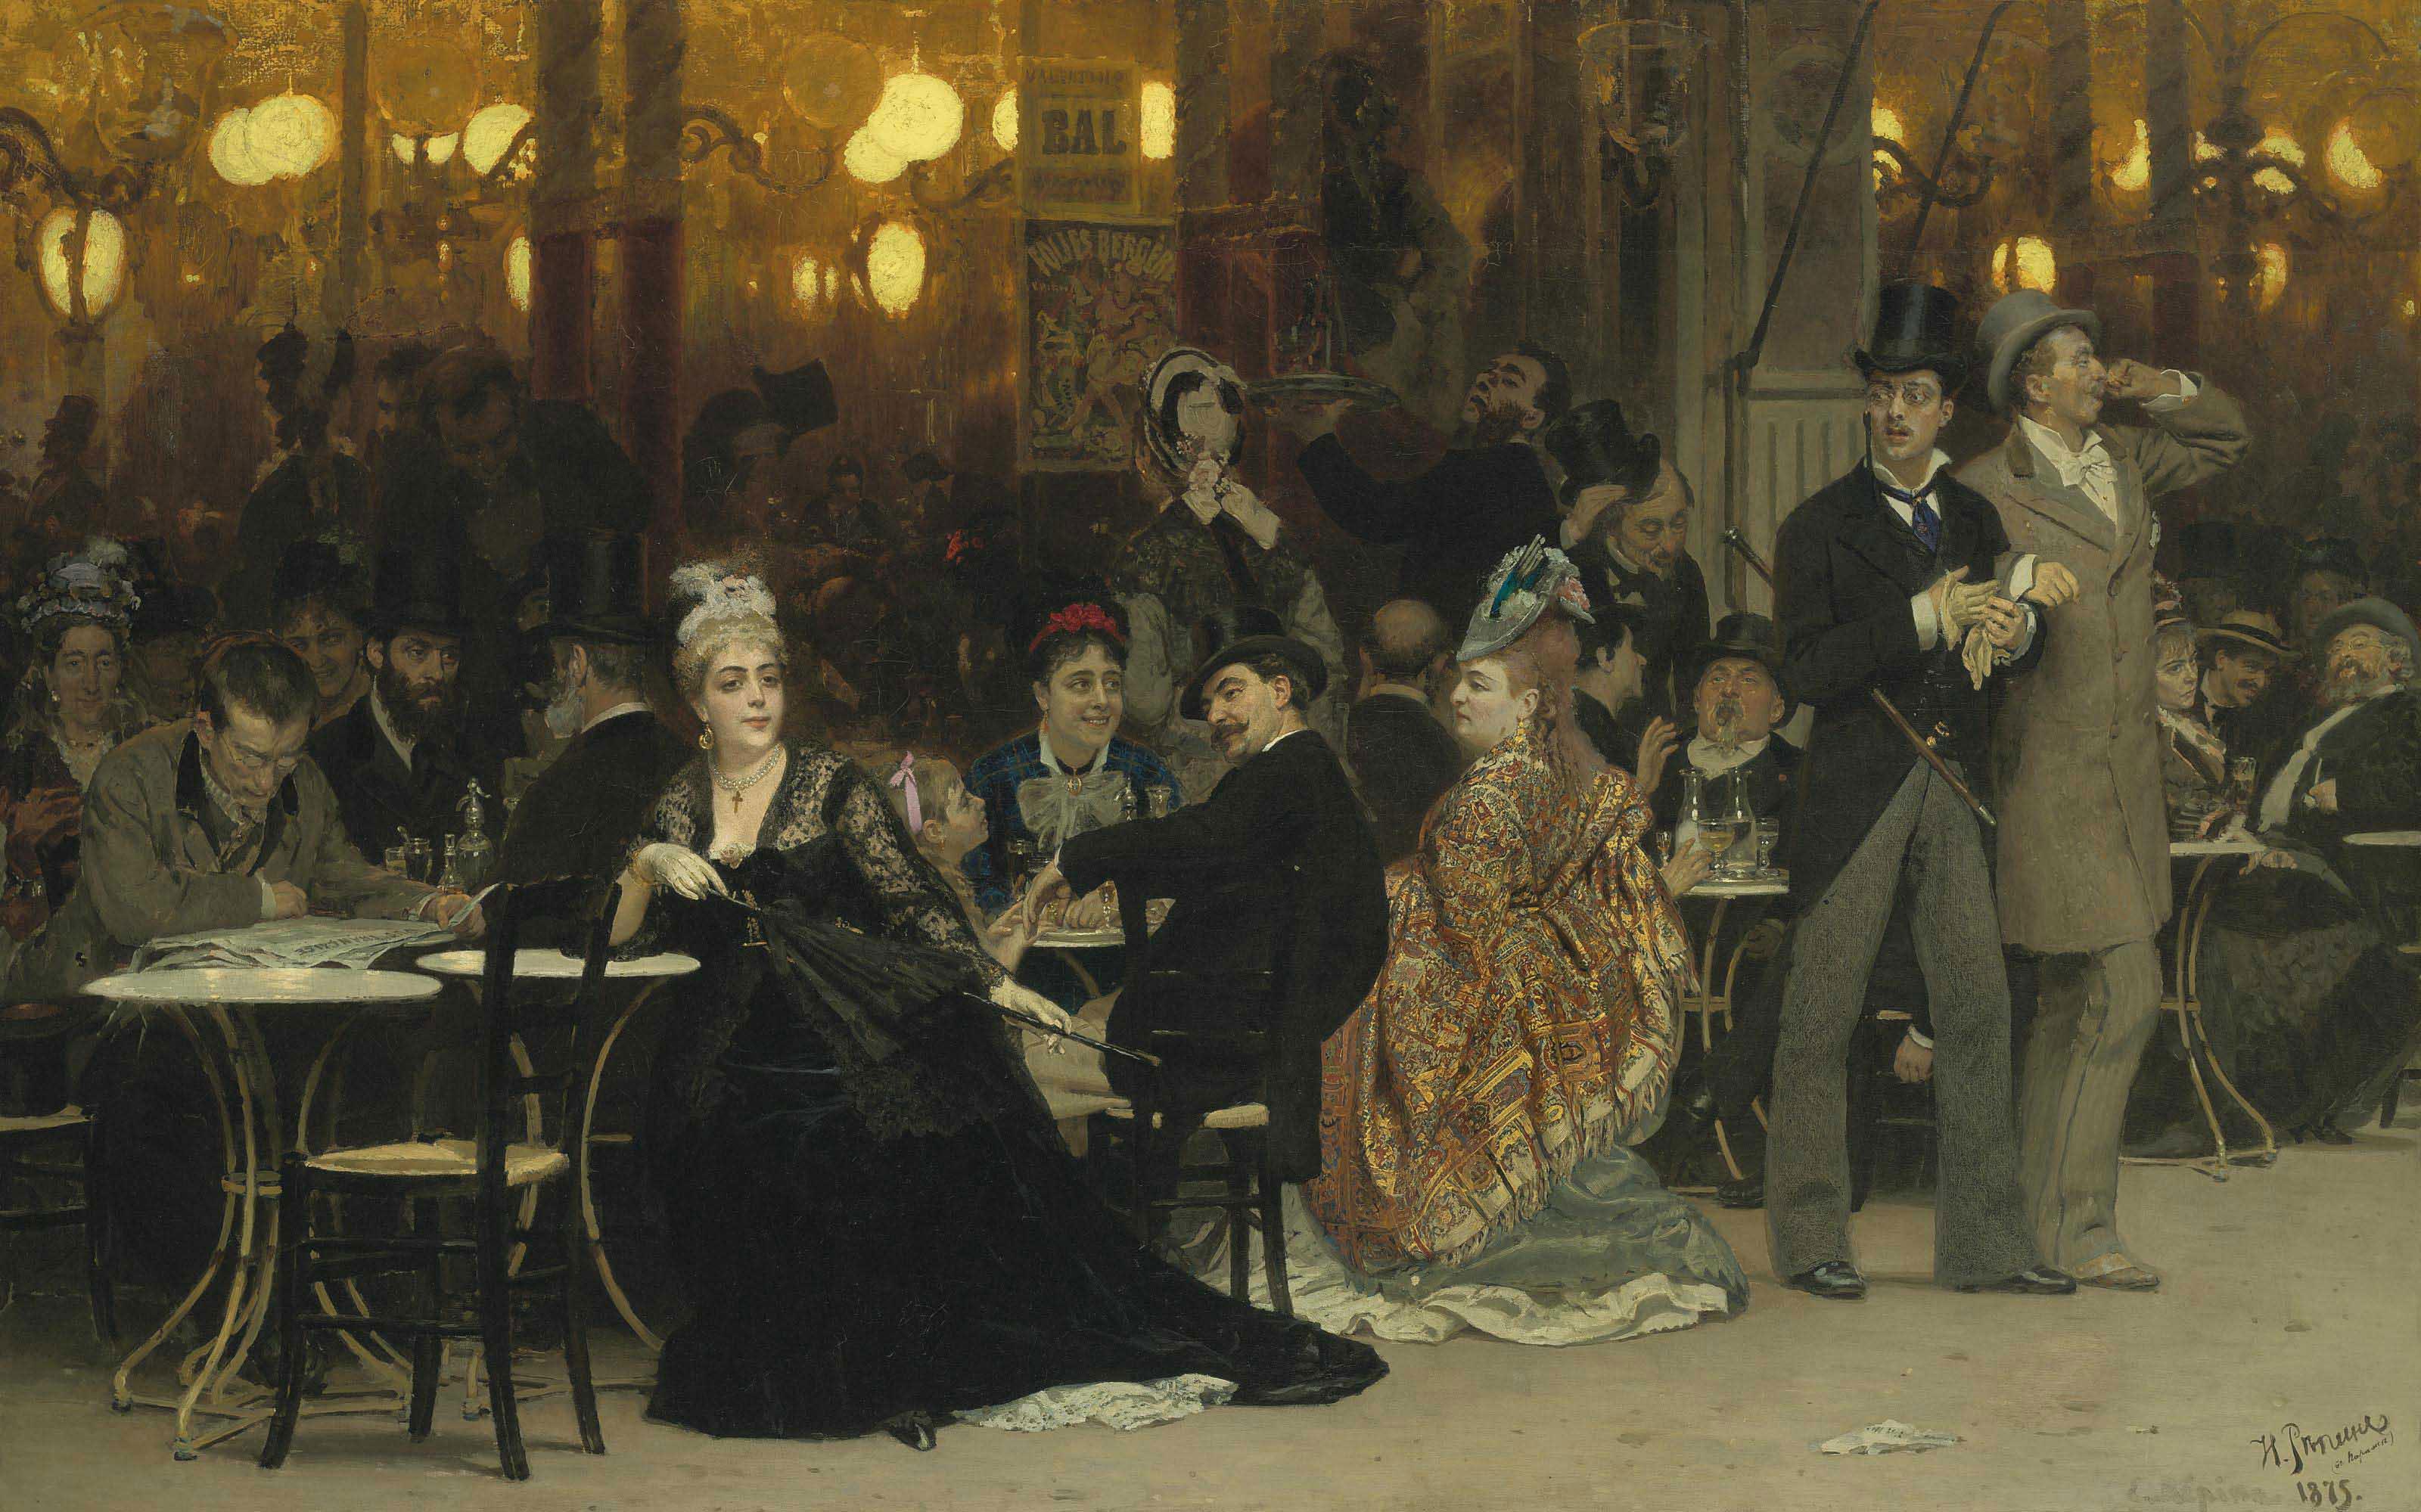 Audio: Ilya Repin's A Parisian Café